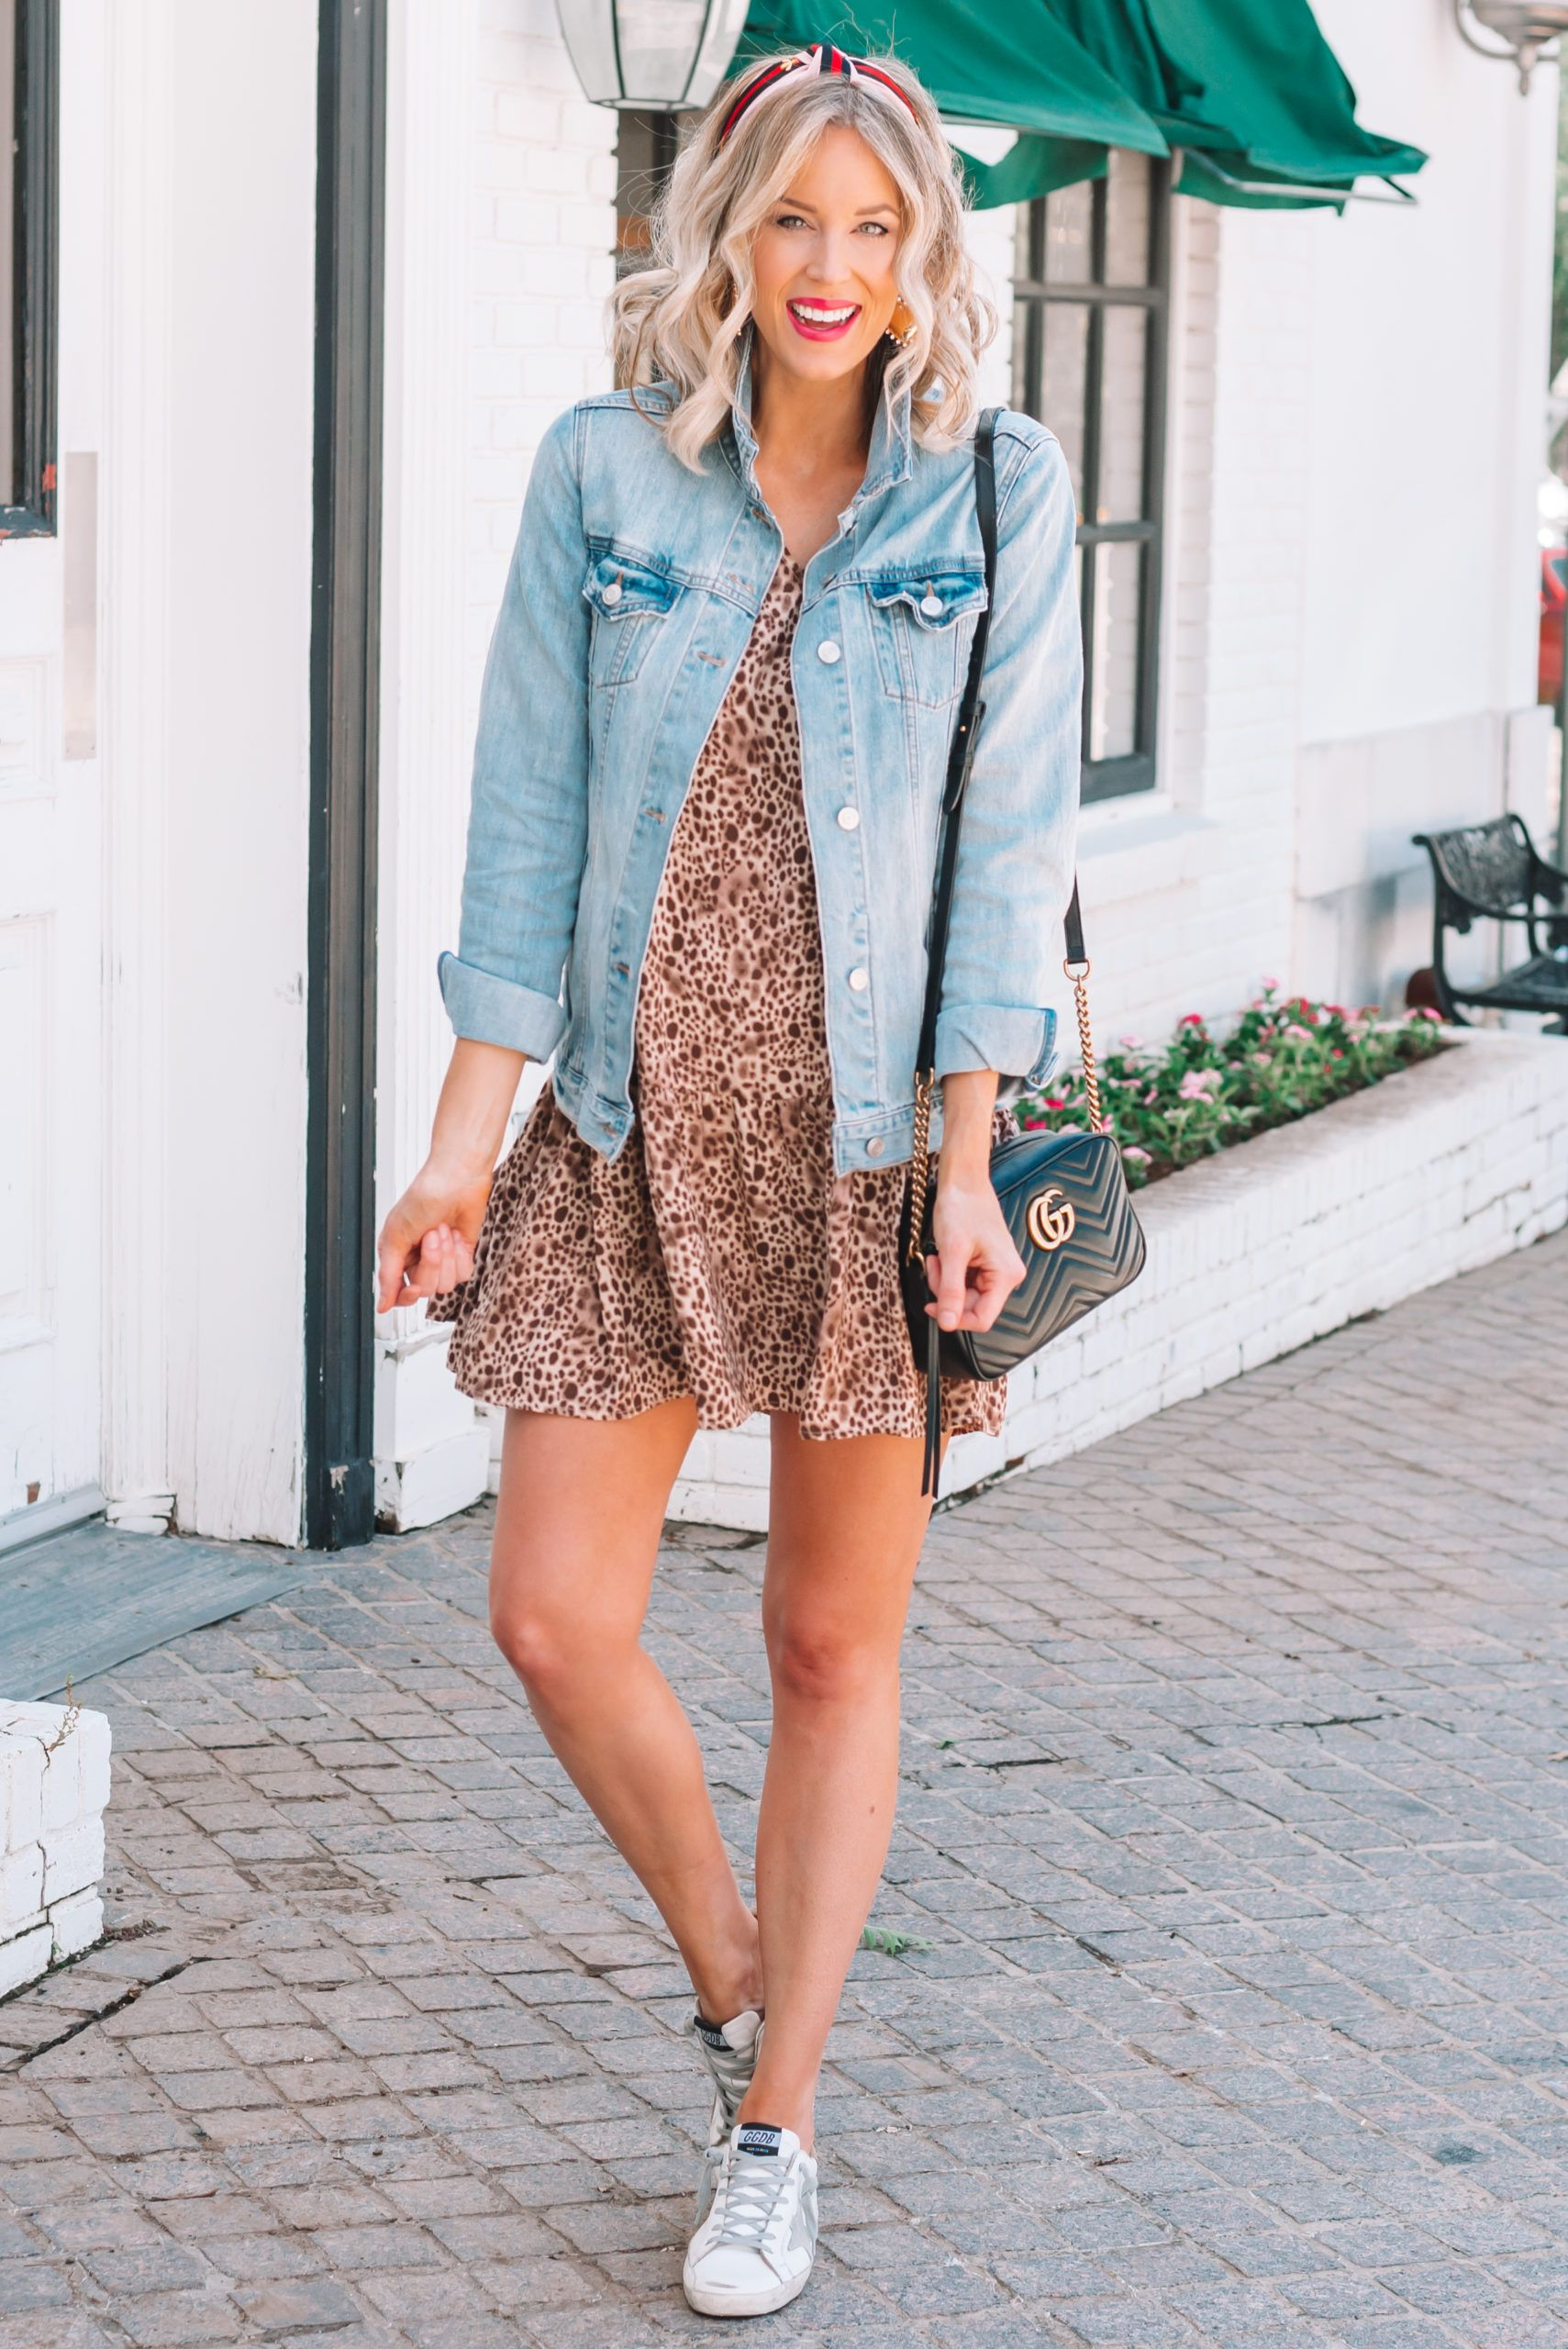 Leopard Drop Waist Dress Straight A Style Denim Jacket With Dress Dropwaist Dress Casual Dress Outfits [ 2560 x 1709 Pixel ]